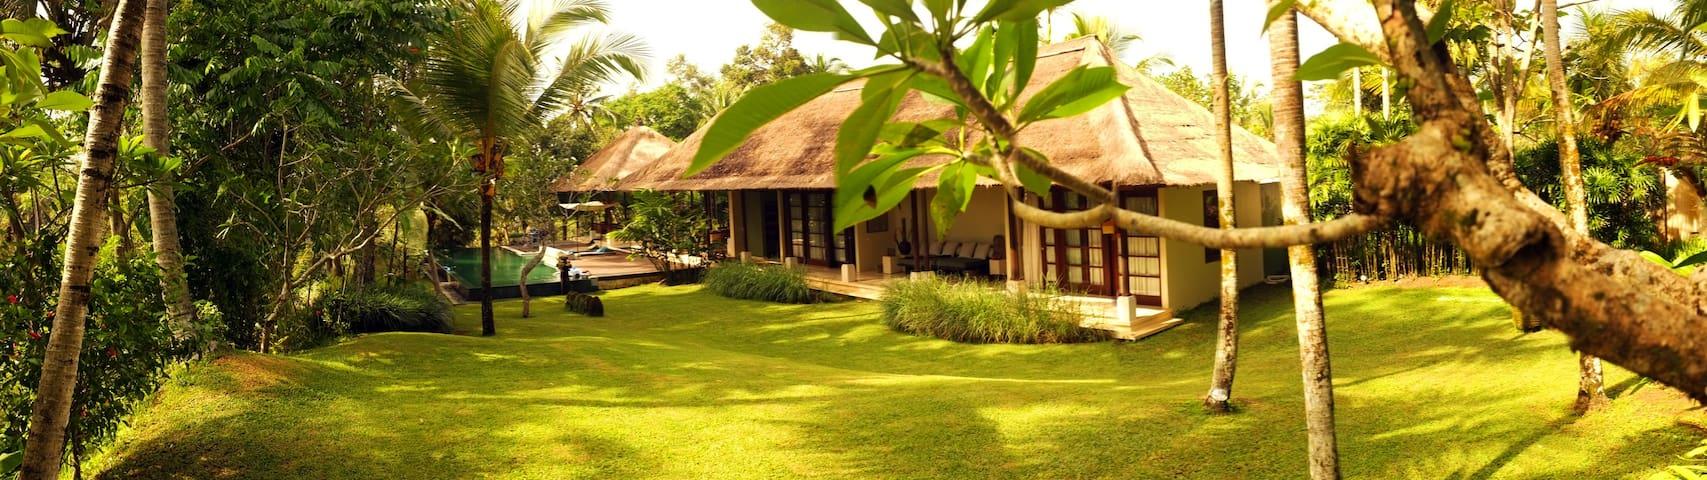 Villa Naga, spacious luxury villa in Payogan, Ubud